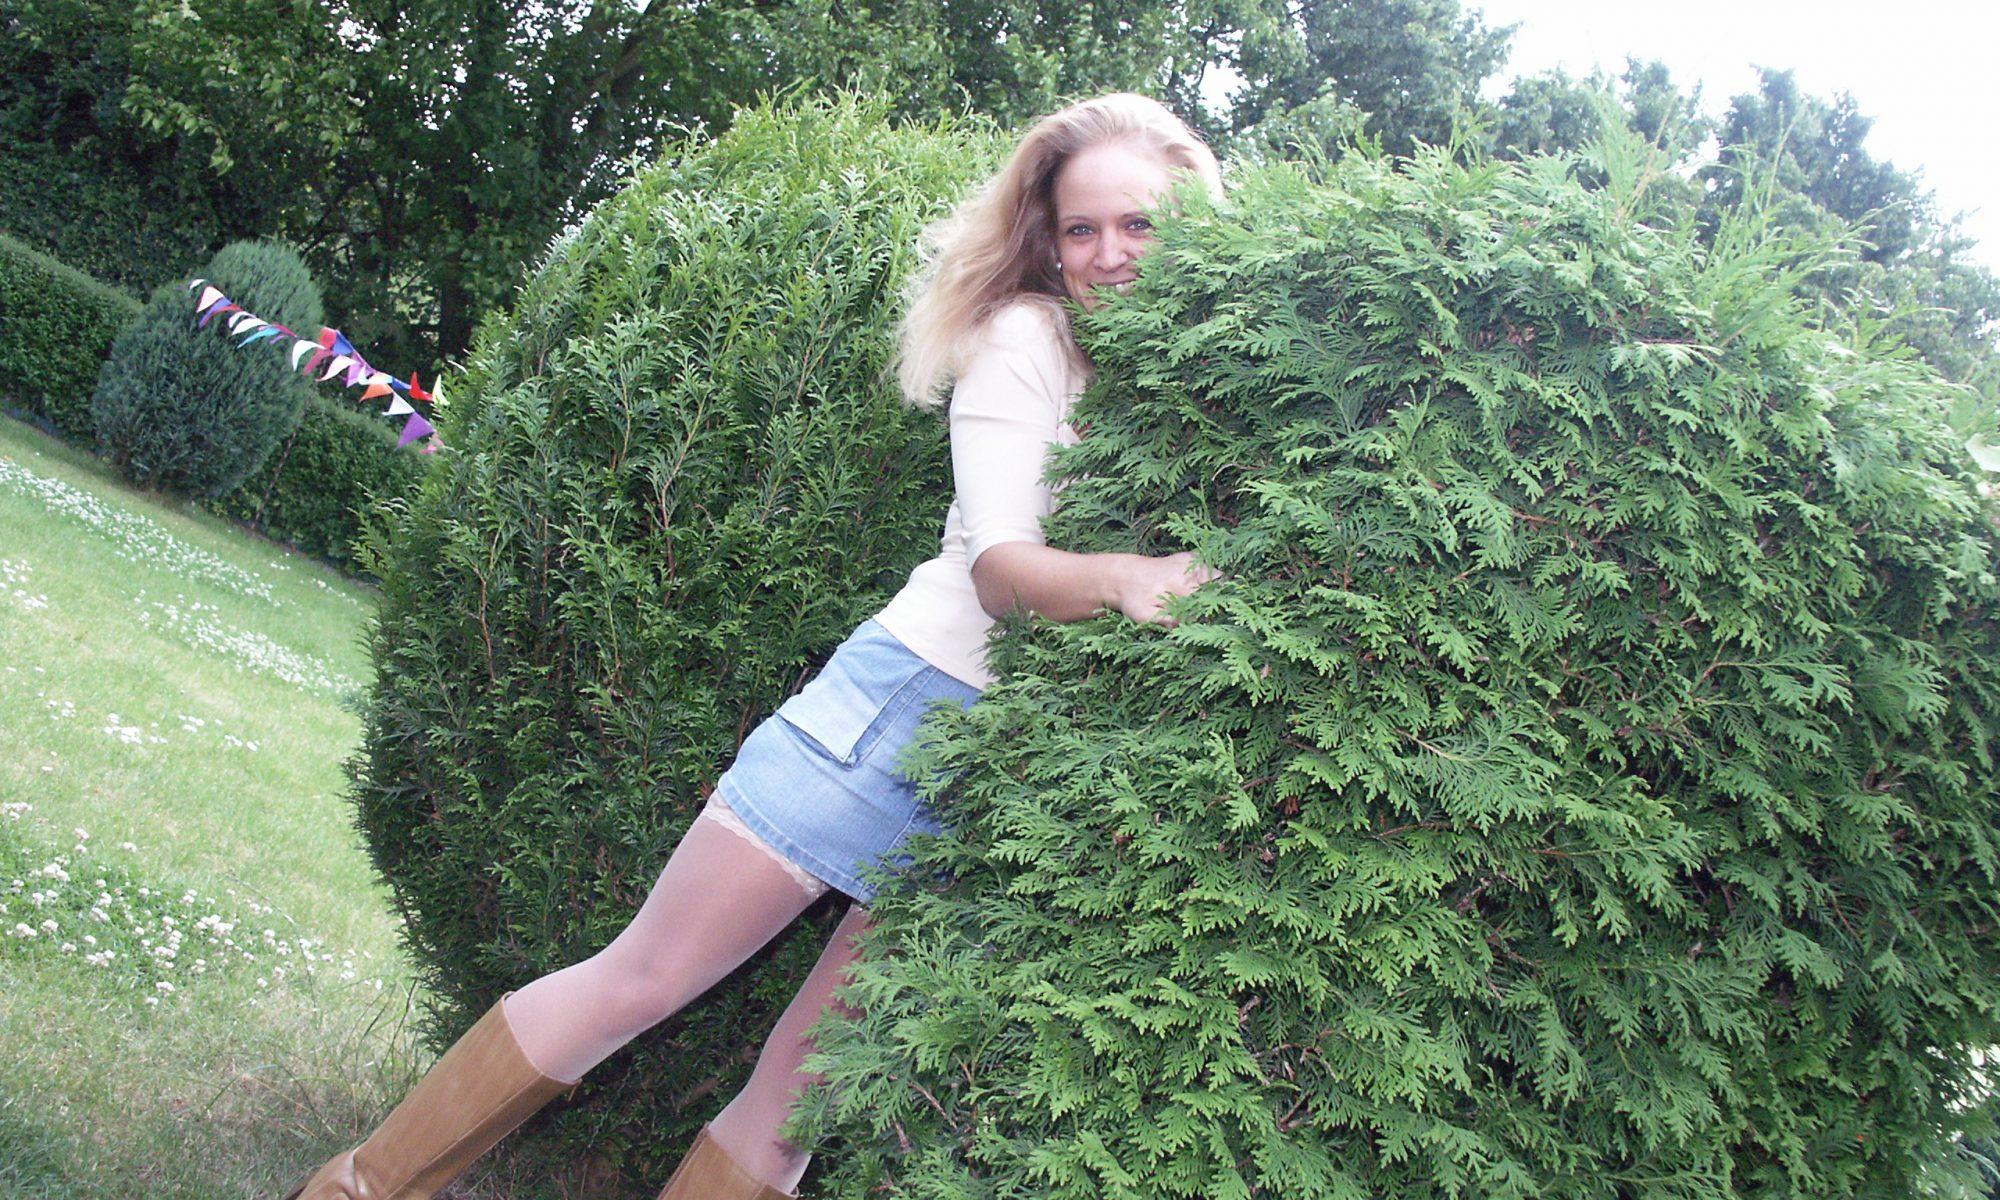 Blondine umarmt Gartenhecke